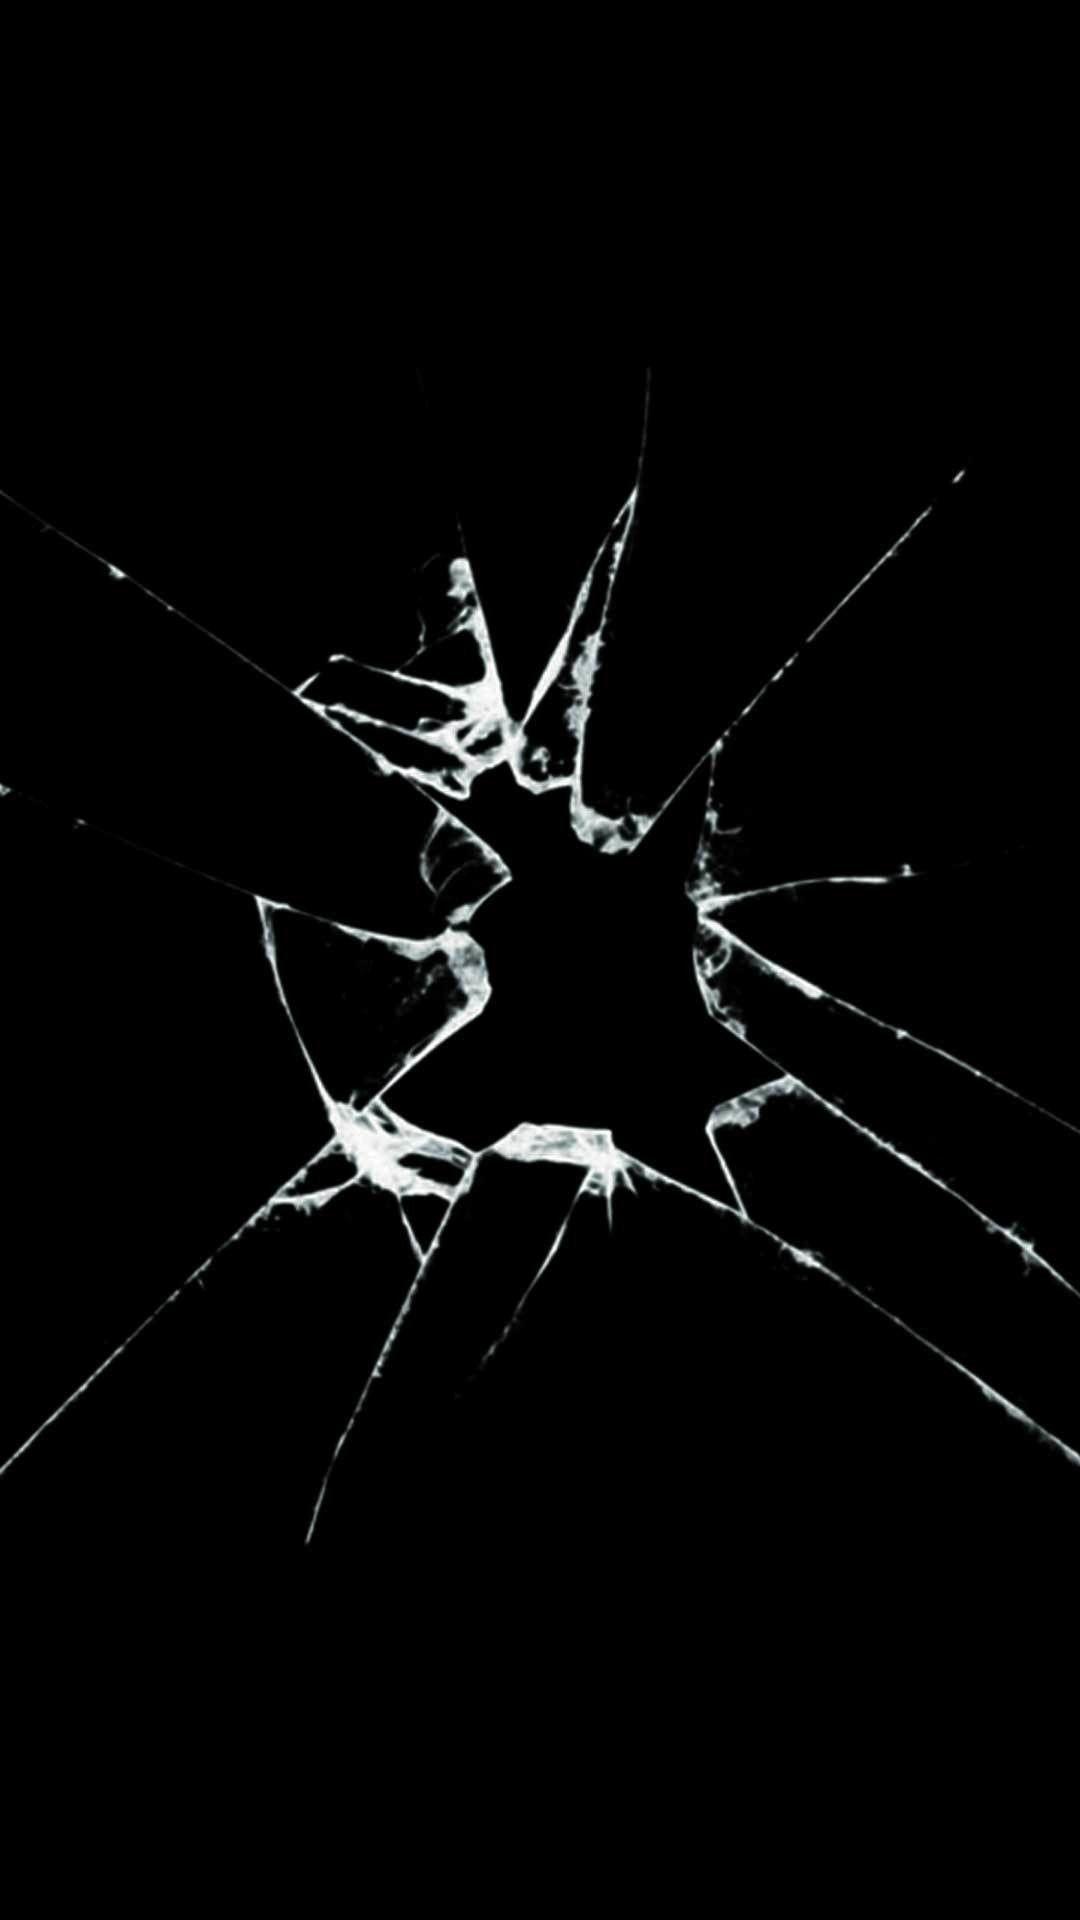 Realistic Broken Screen Wallpaper Android In 2020 Broken Screen Wallpaper Cracked Phone Screen Screen Wallpaper Hd